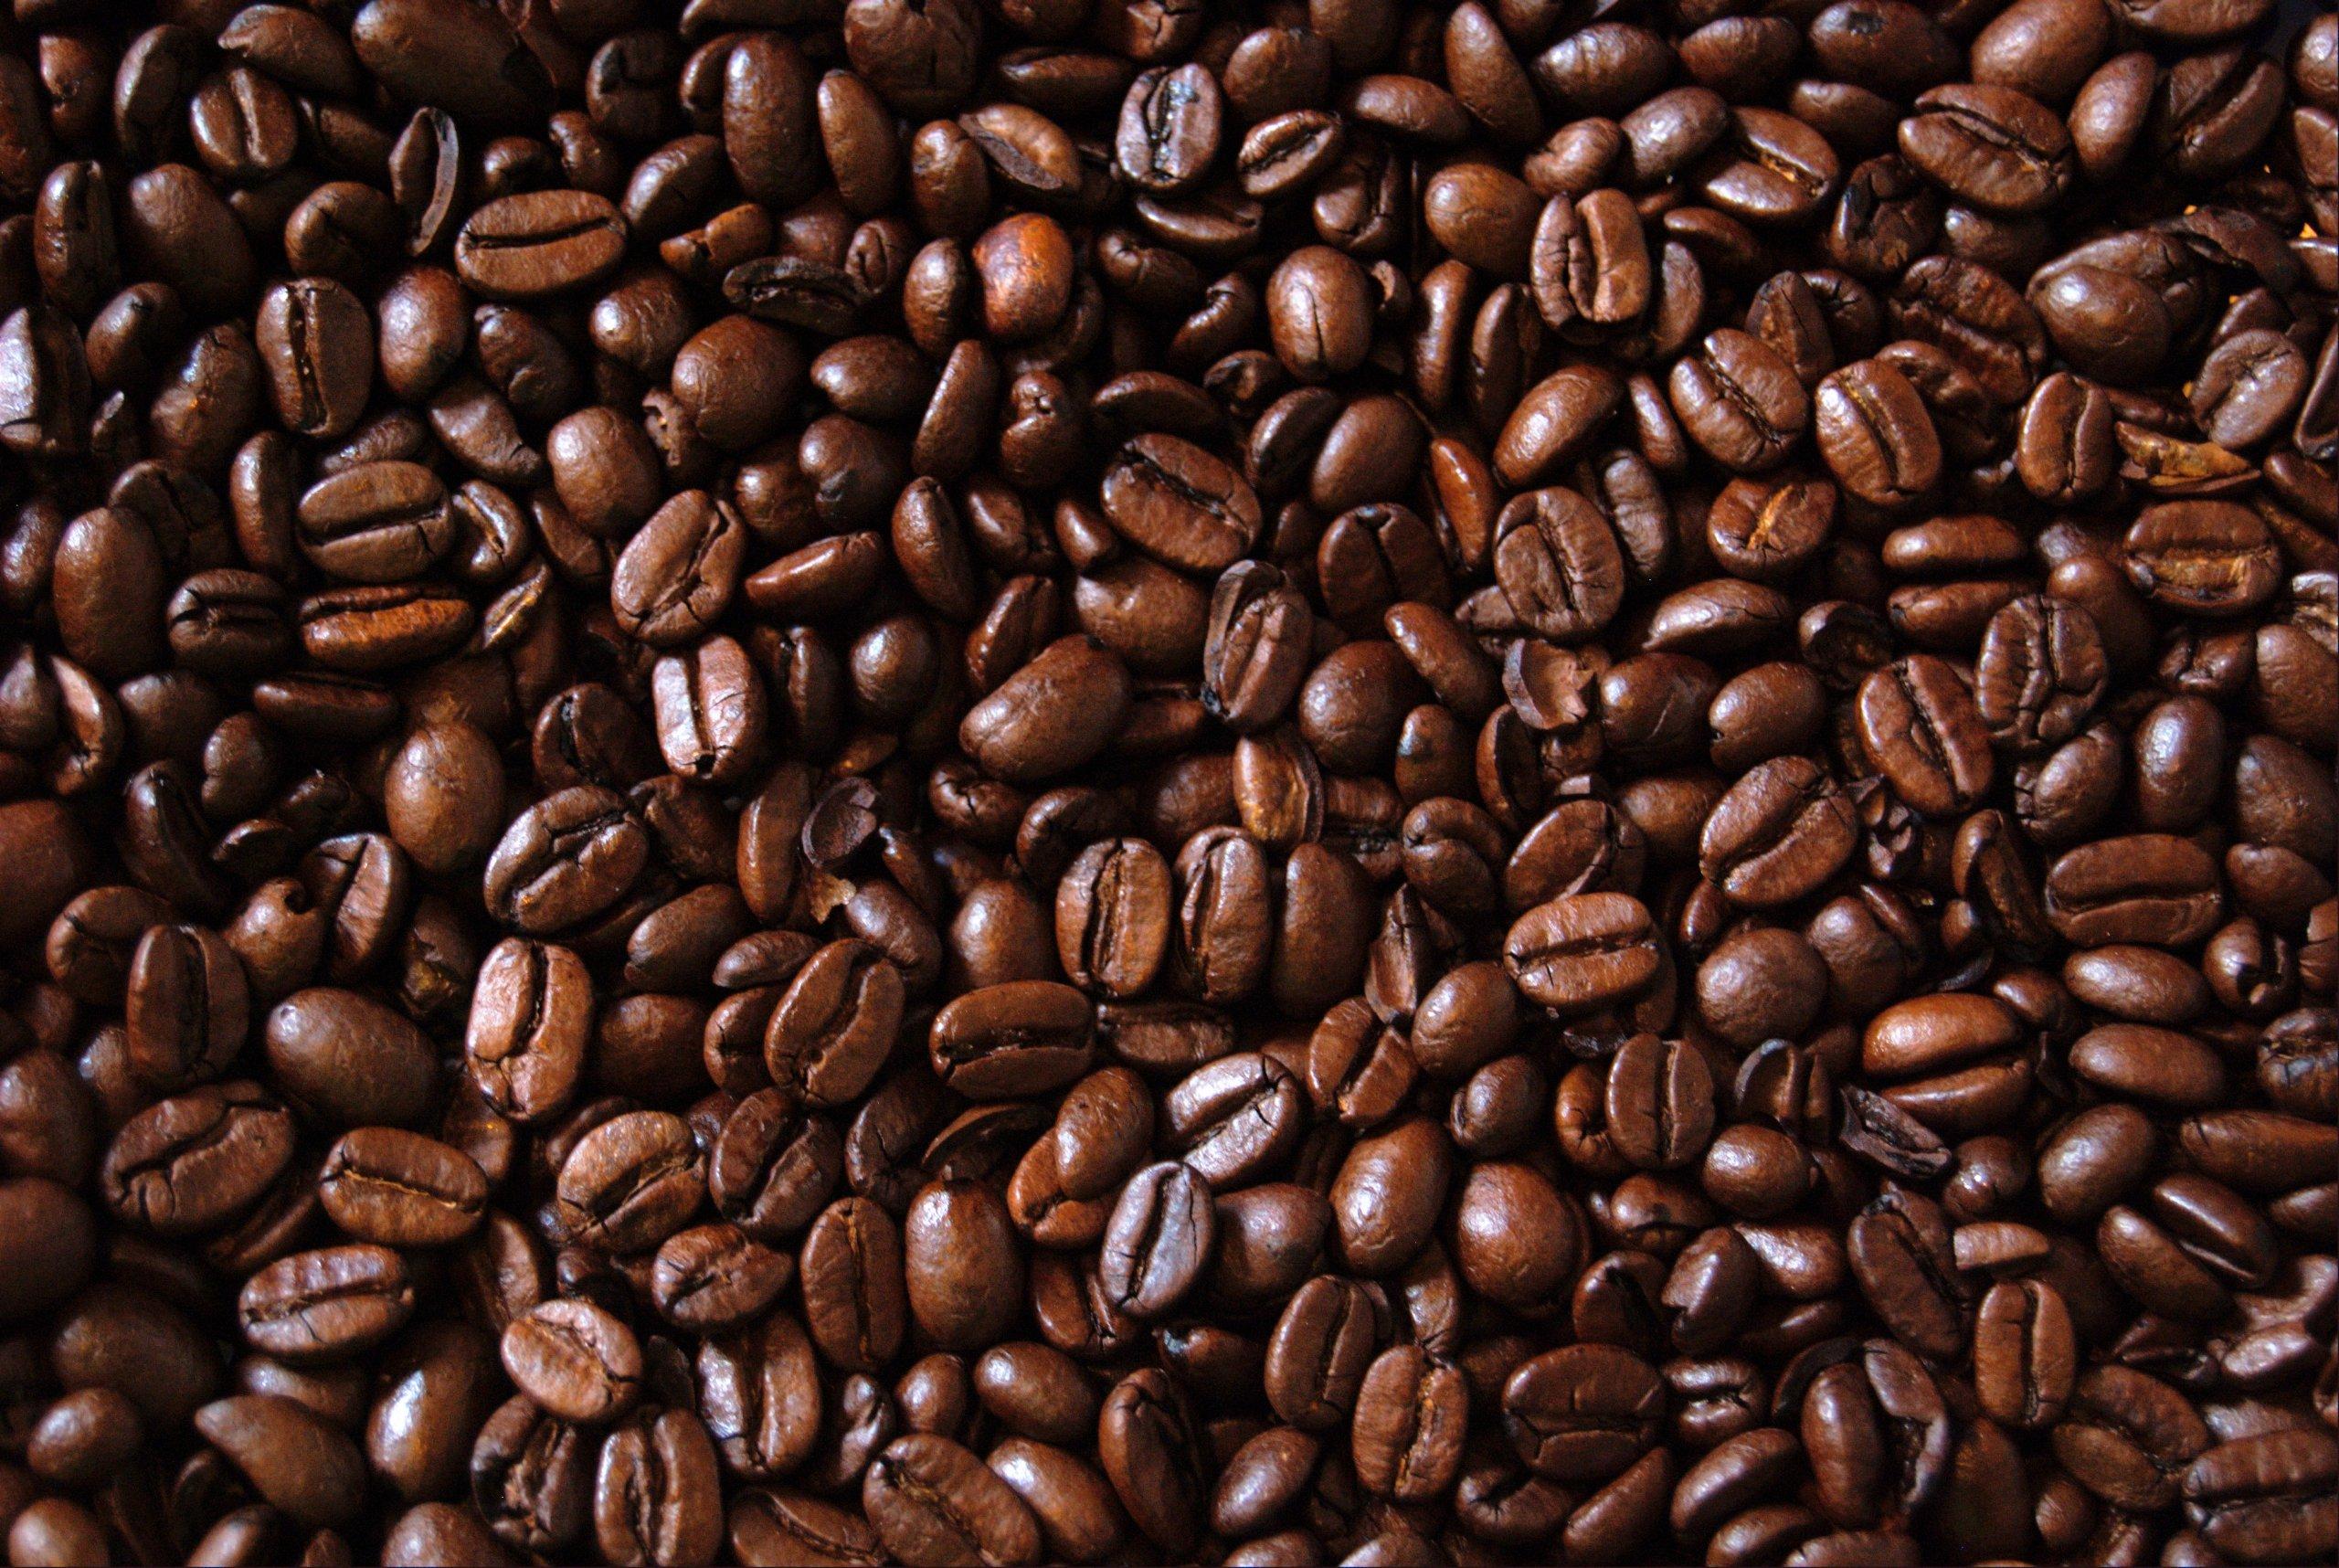 Peru Approcassi Cajamarca Fair Trade Shade Grown Organic Coffee Beans (Medium Roast (Full City +), 15 Pounds Whole Beans) by RhoadsRoast Coffees (Image #7)